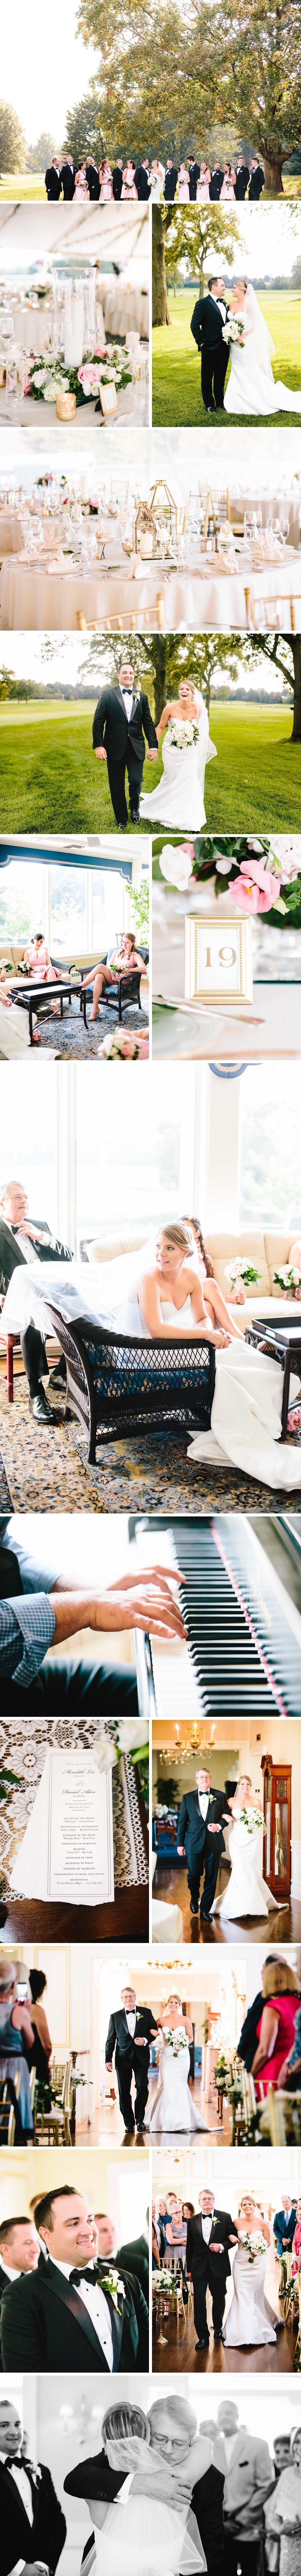 chicago-fine-art-wedding-photography-niemiec4